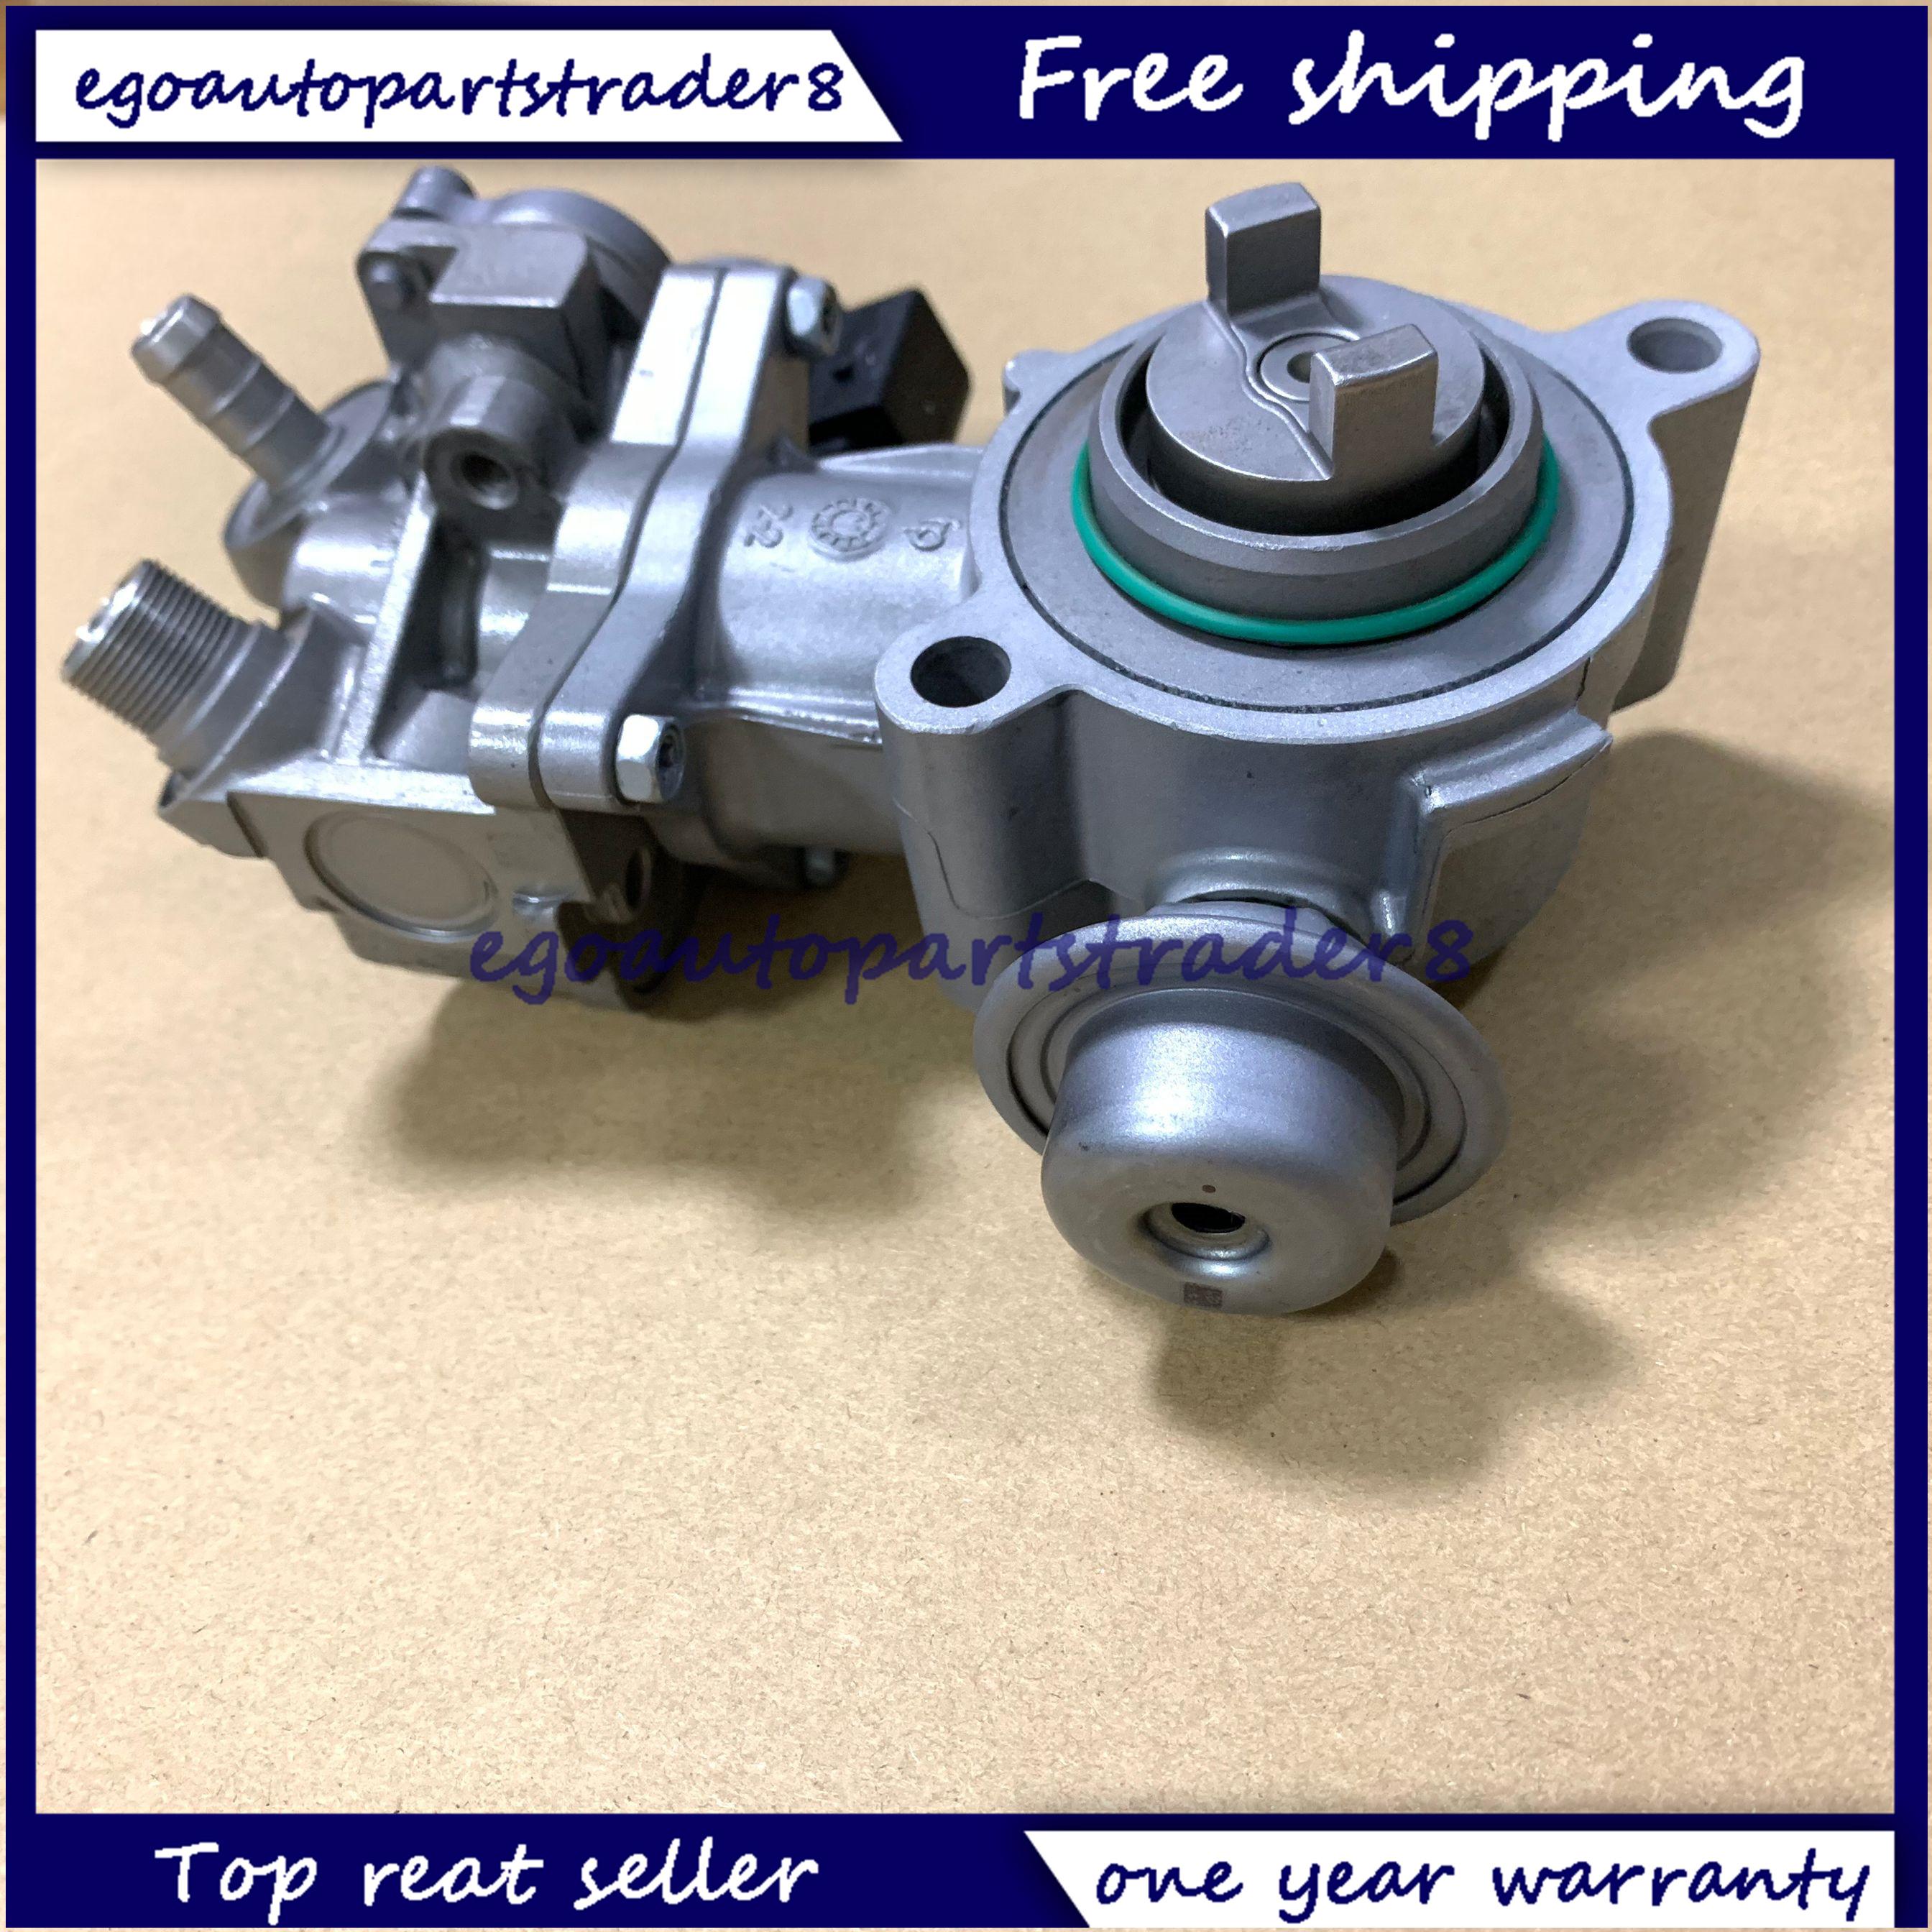 2710703501 High Pressure Injection Pump For Mercedes-Benz W212 W204 C250 Cgi